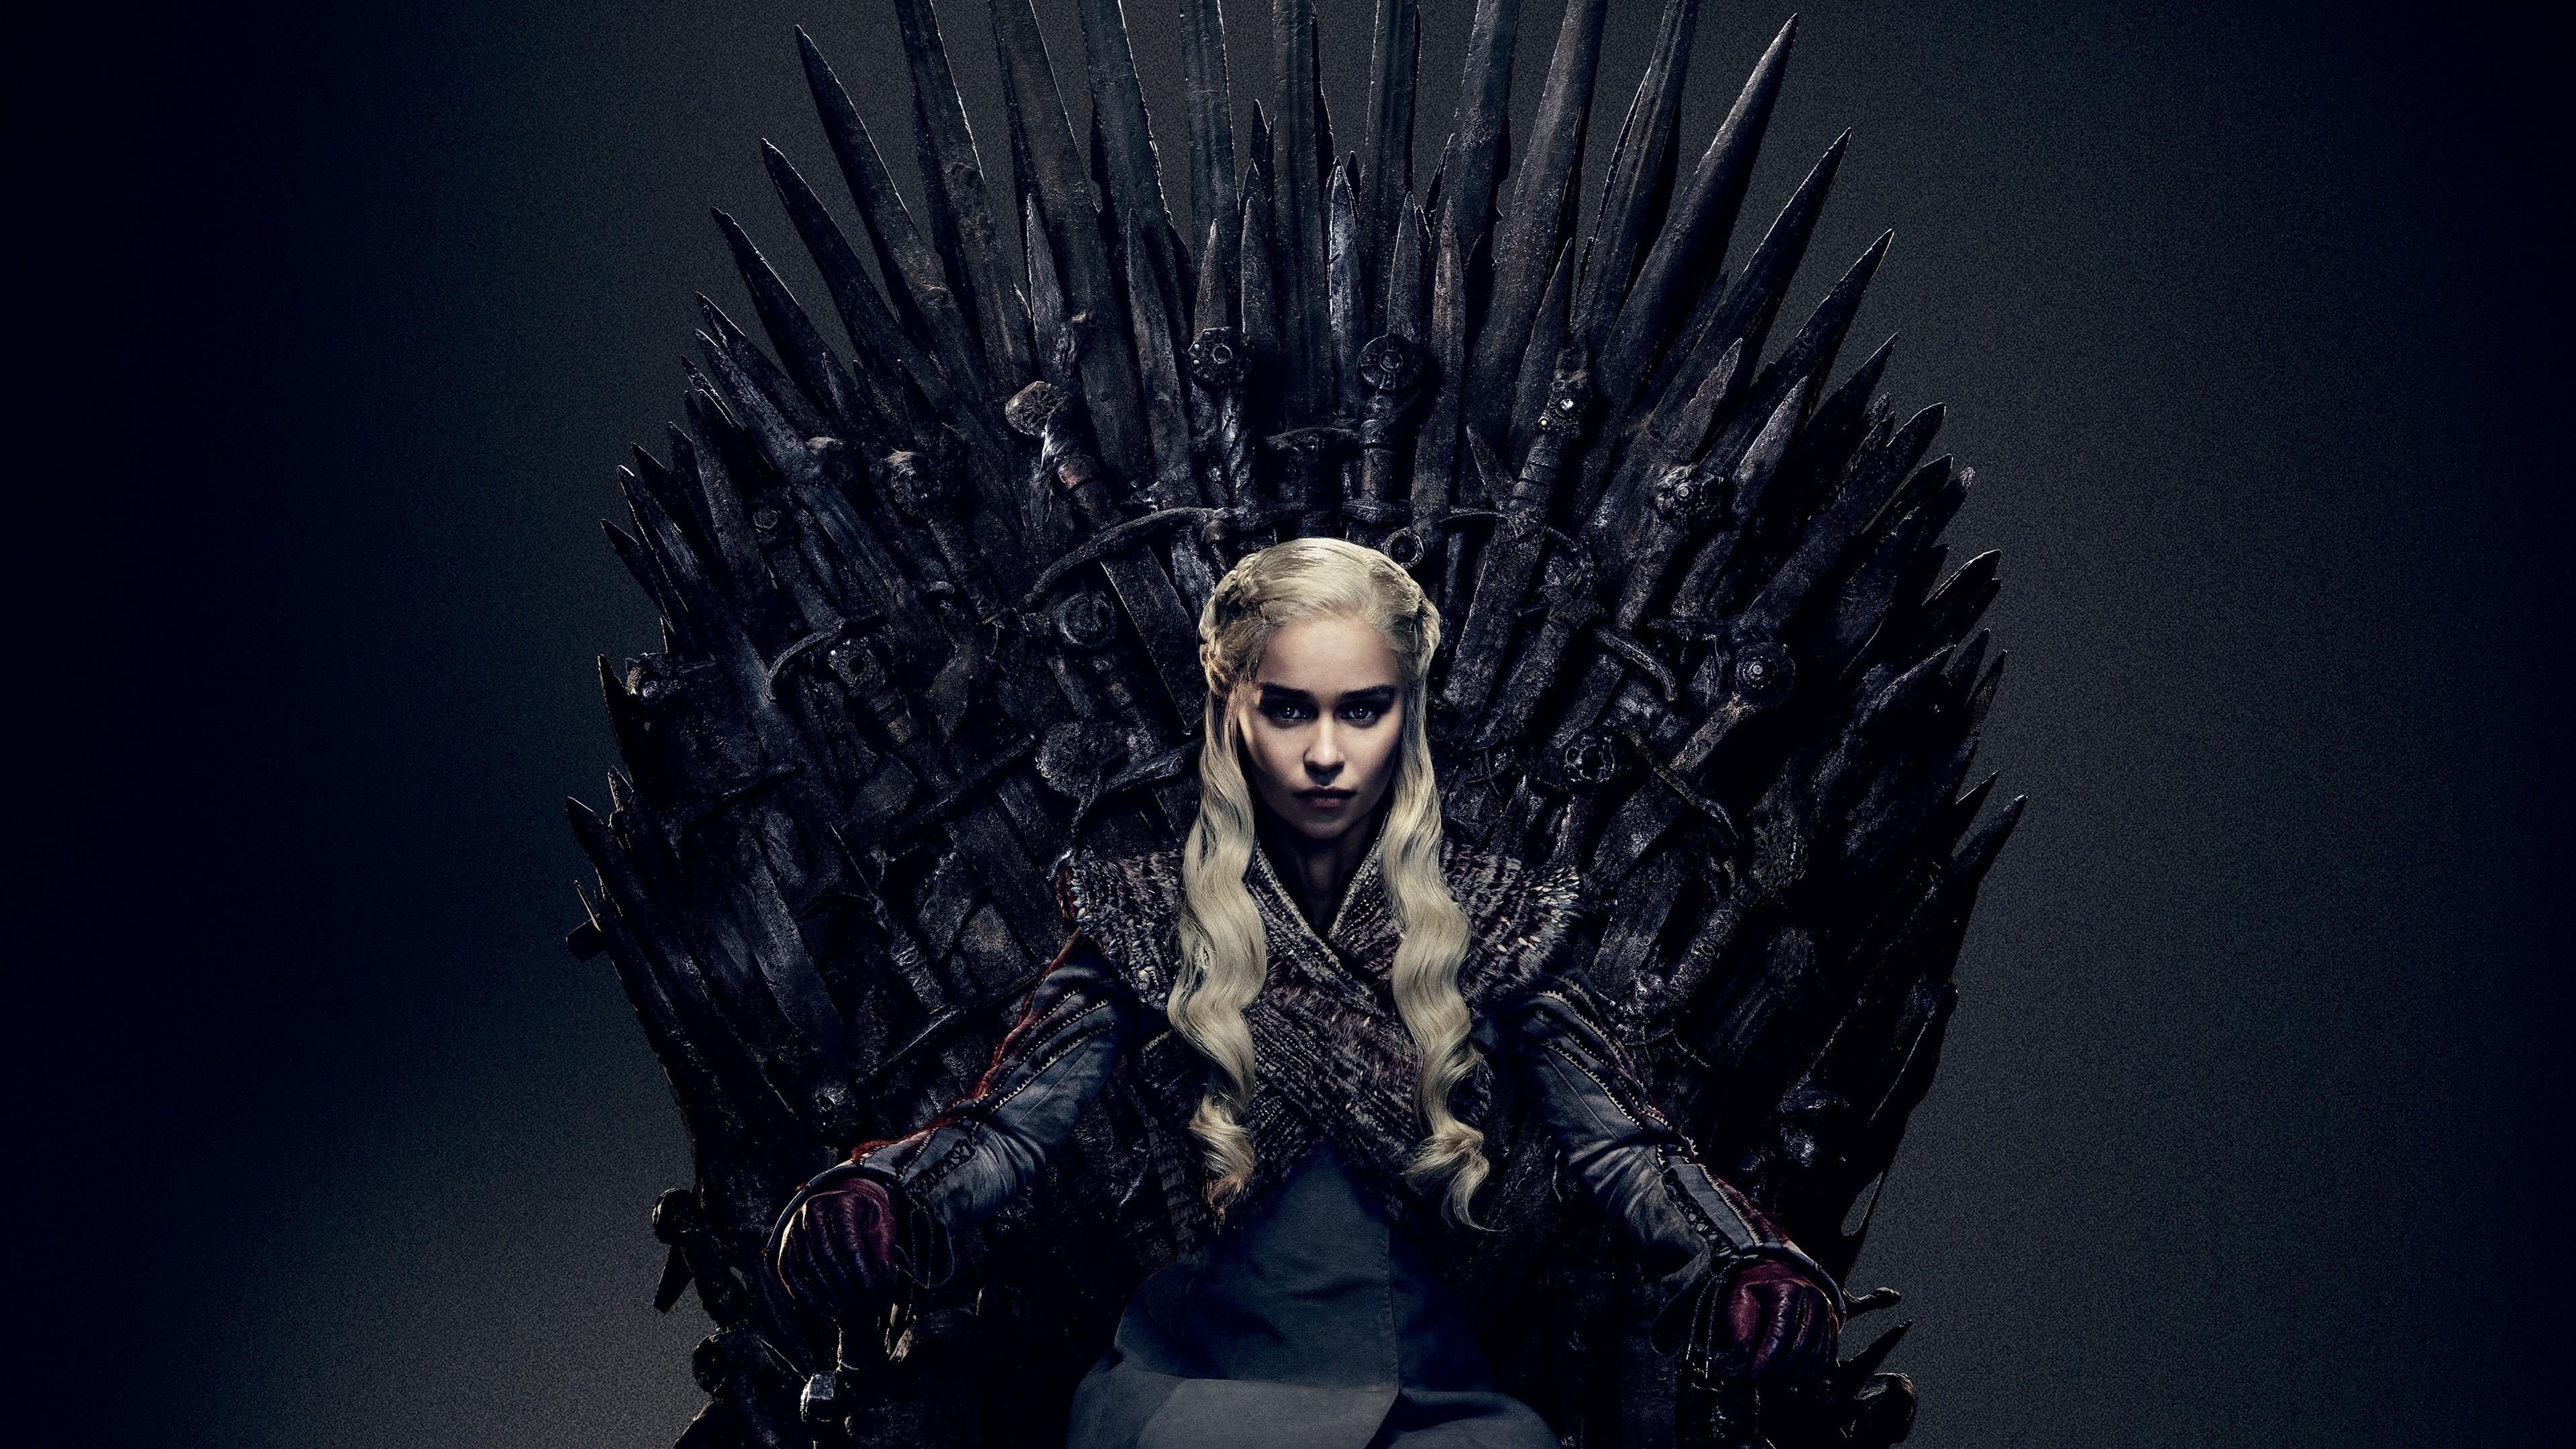 Game Of Thrones Wallpaper 4k 2594592 Hd Wallpaper